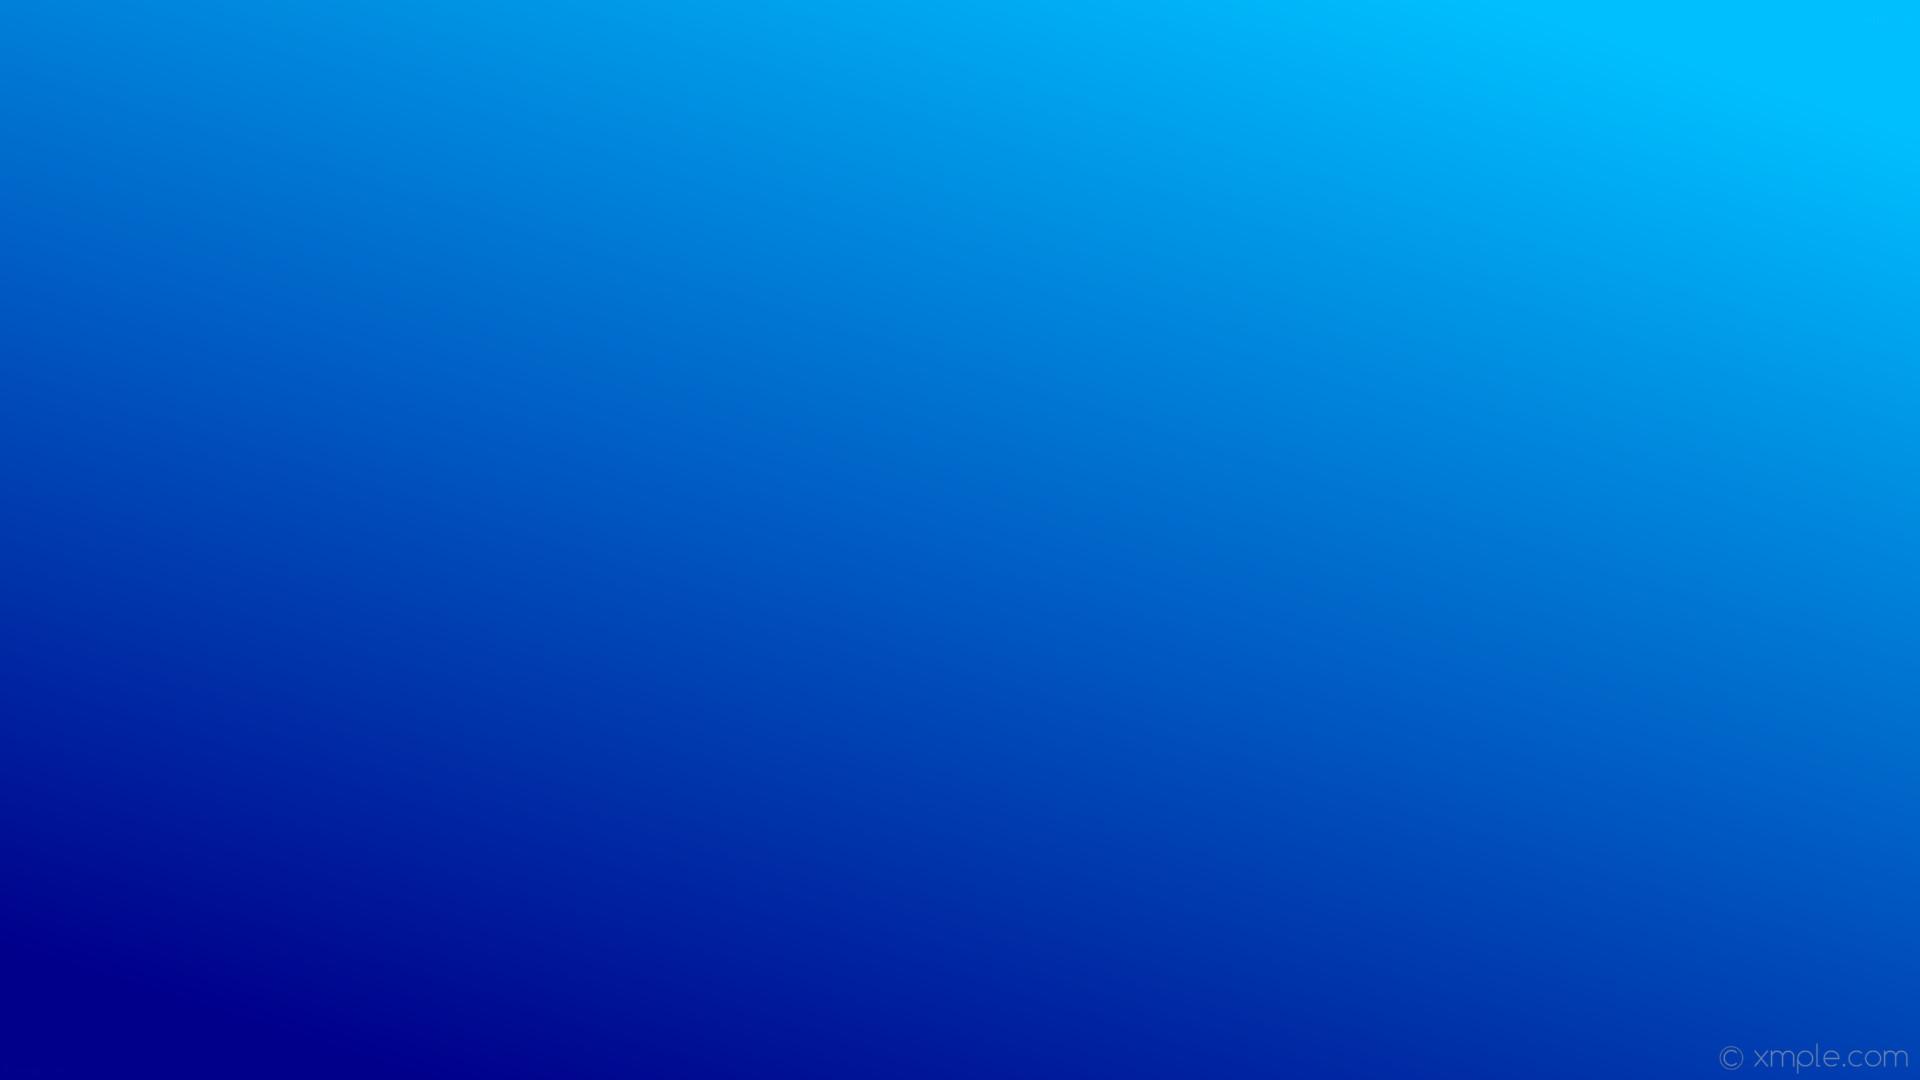 Res: 1920x1080, wallpaper linear blue gradient dark blue deep sky blue #00008b #00bfff 225°